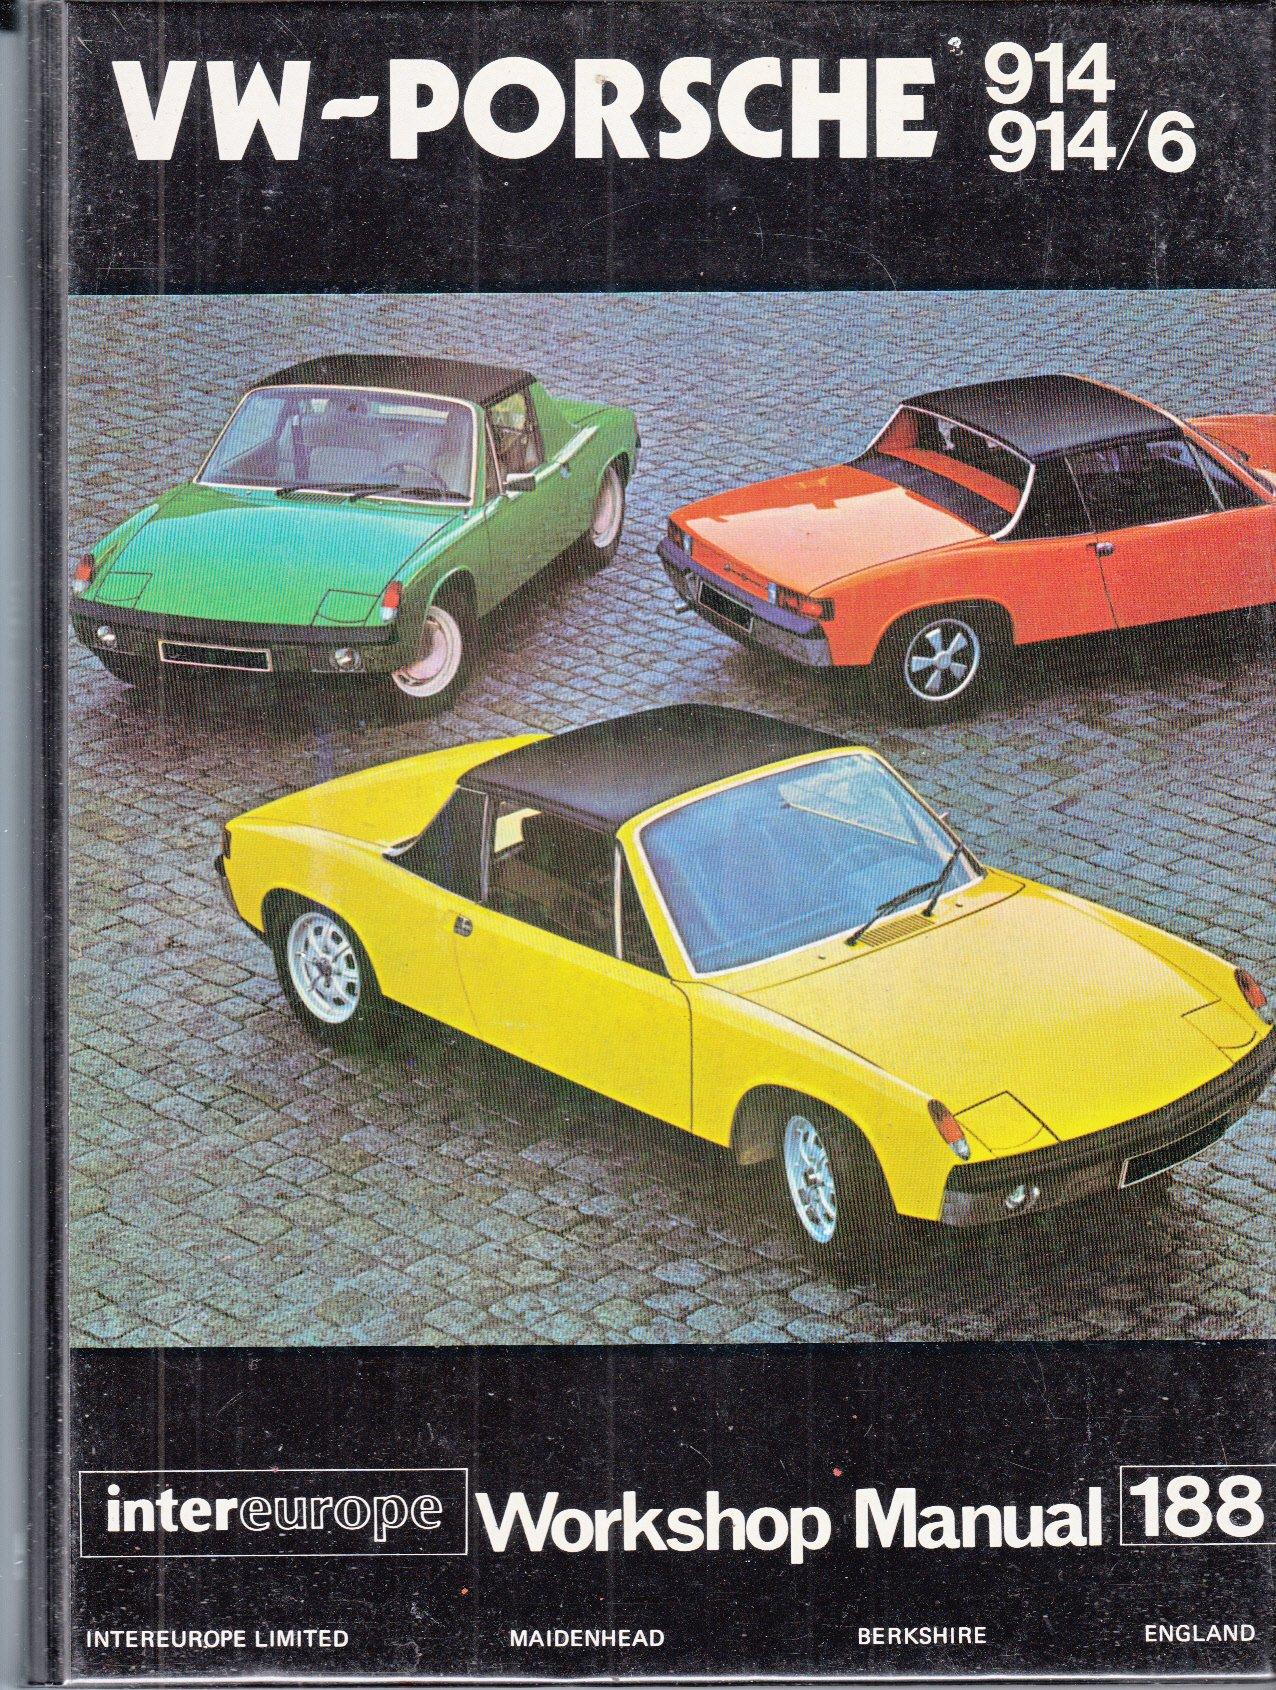 Porsche 9149146 workshop manual paul harris 9780901610942 porsche 9149146 workshop manual paul harris 9780901610942 amazon books fandeluxe Images